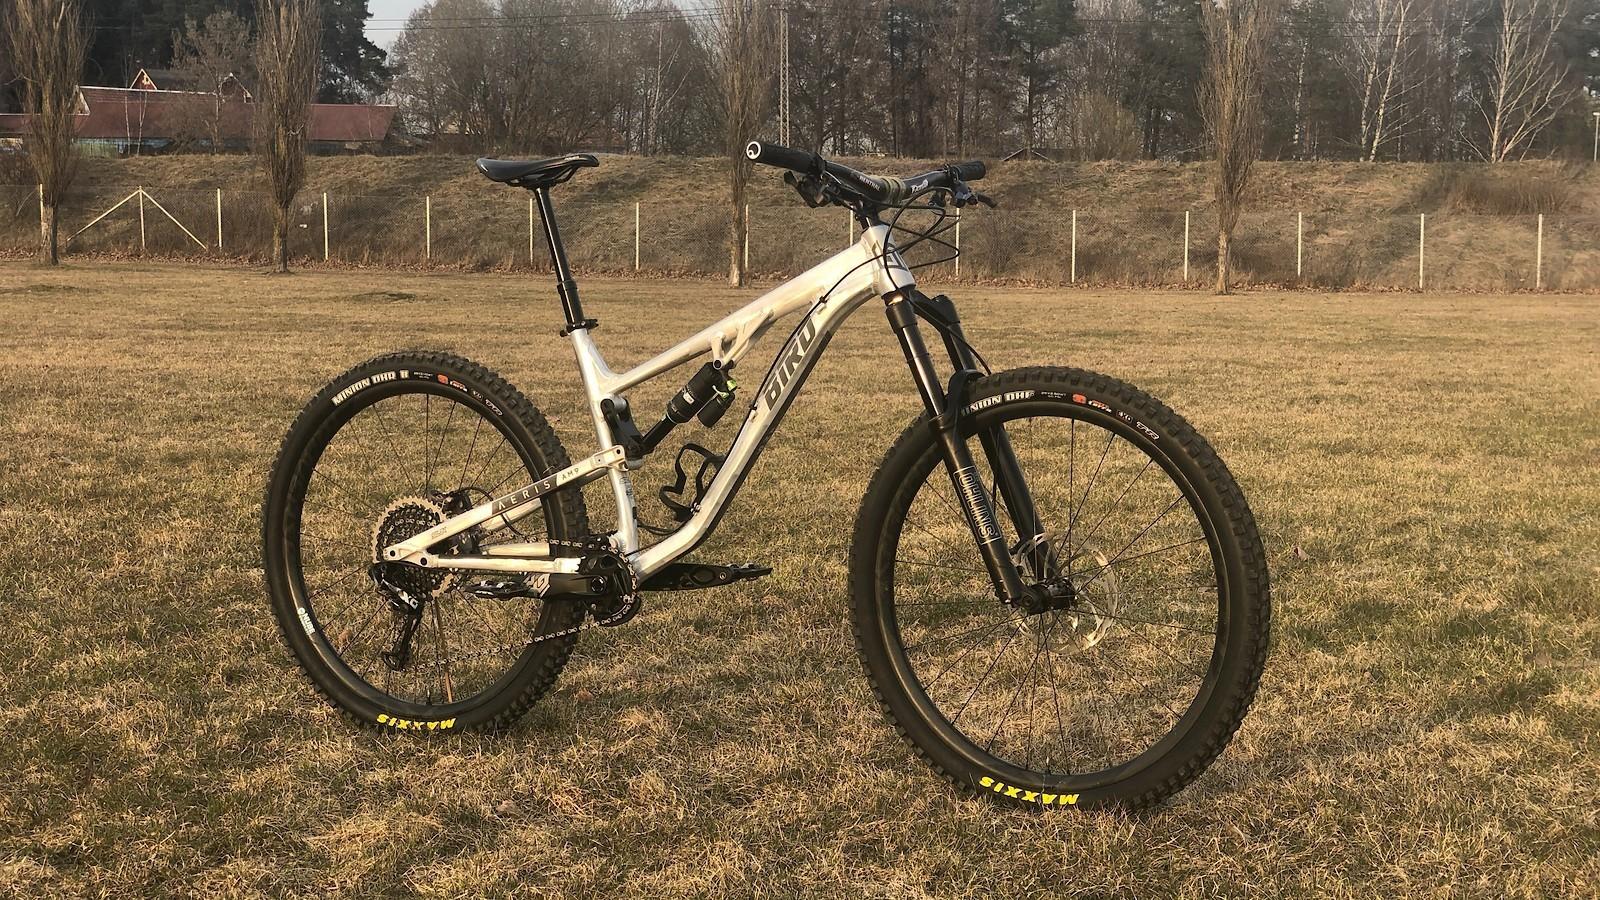 Bird Aeris AM9 - 2019 Vital Bike of the Day Collection - Mountain Biking Pictures - Vital MTB